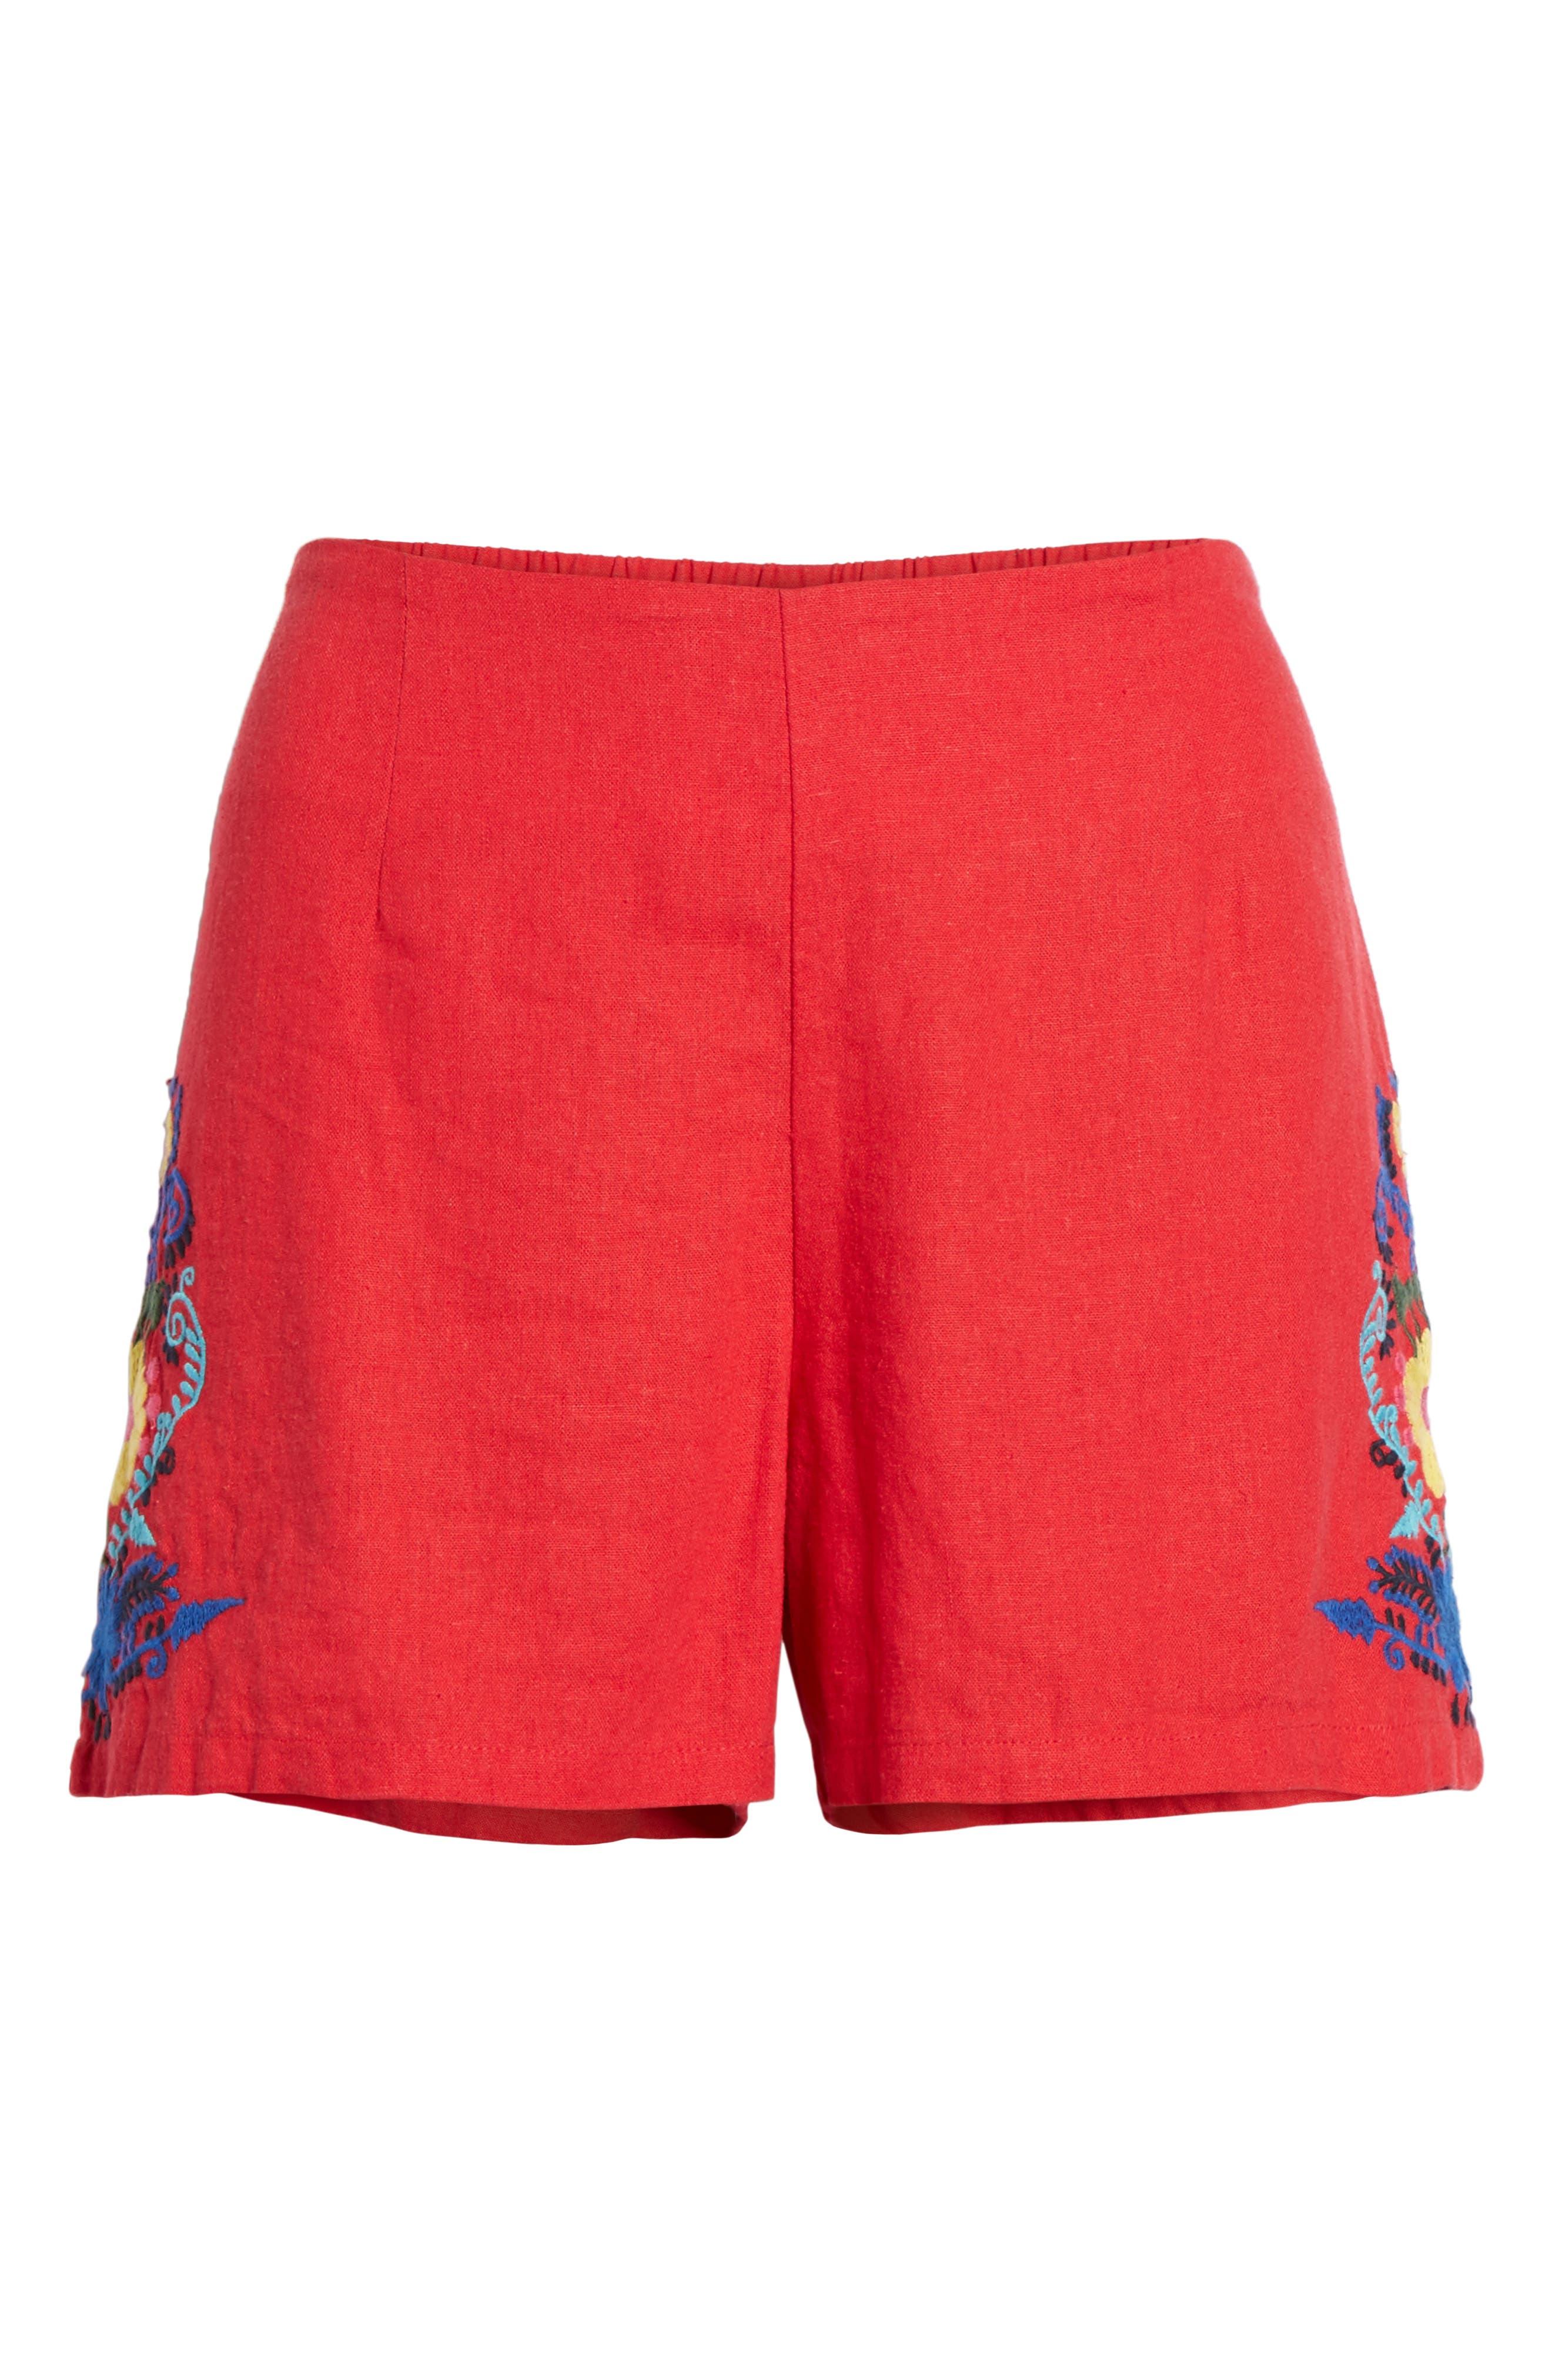 Embroidered Linen Blend Shorts,                             Alternate thumbnail 6, color,                             610